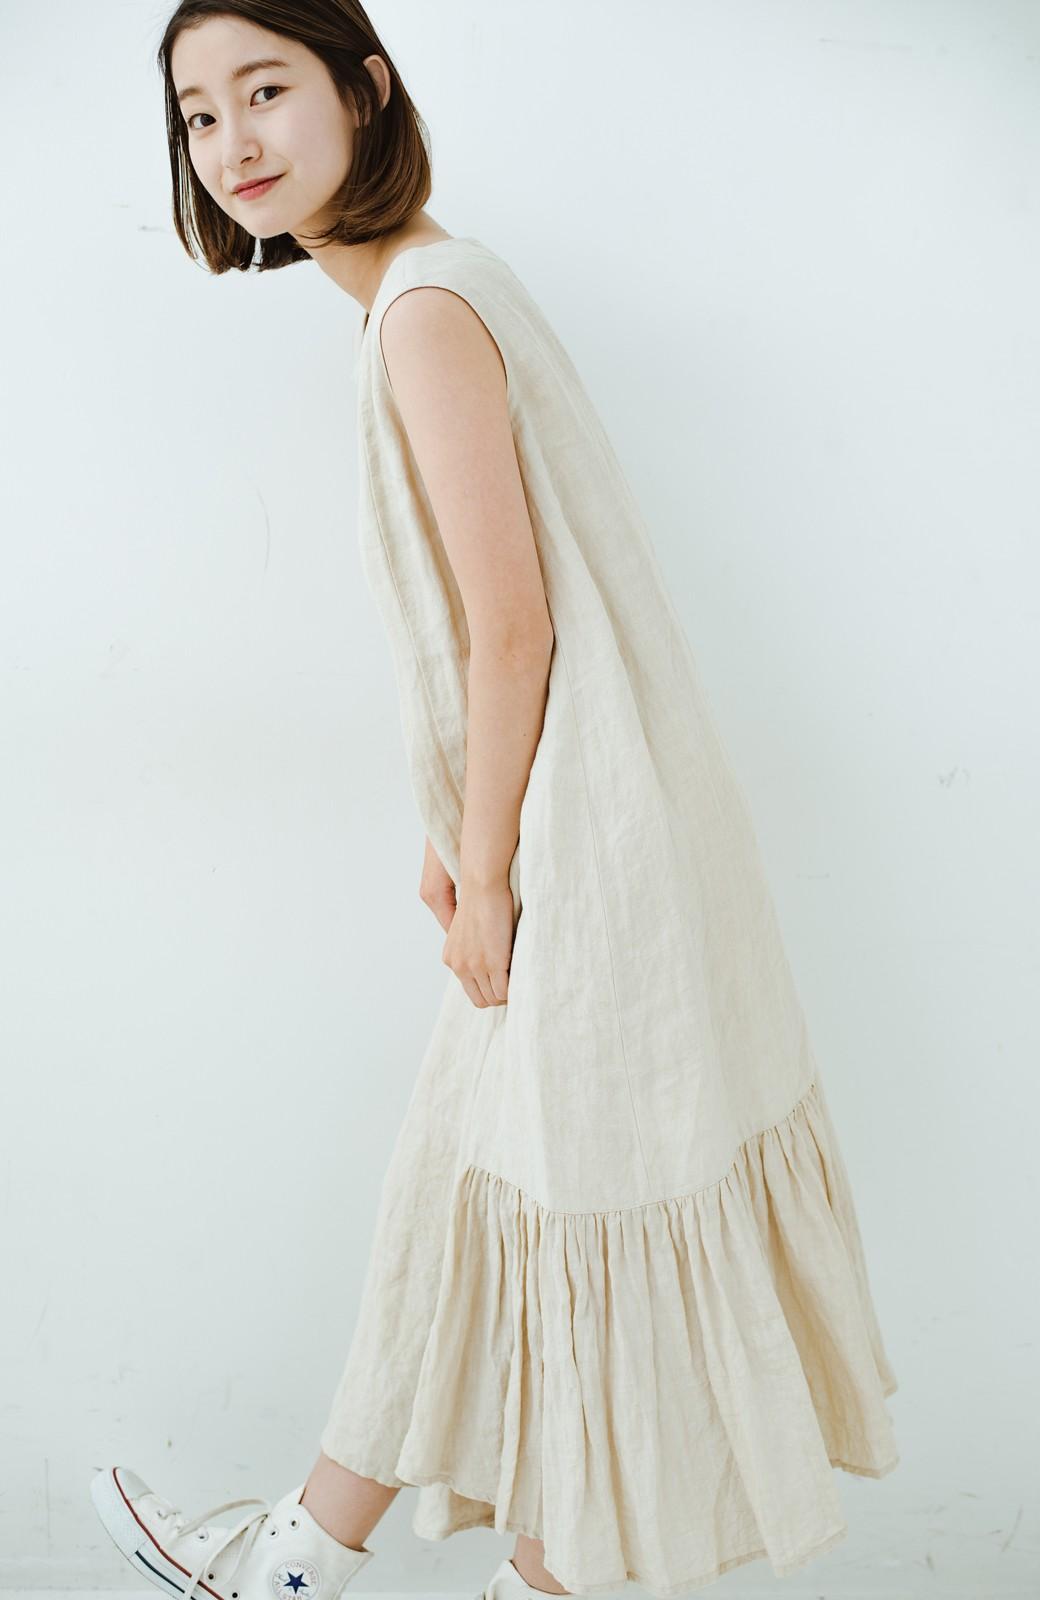 haco! てとひとて Miho Umezawa TWILL LINEN アシンメトリードレス <ライトベージュ>の商品写真16